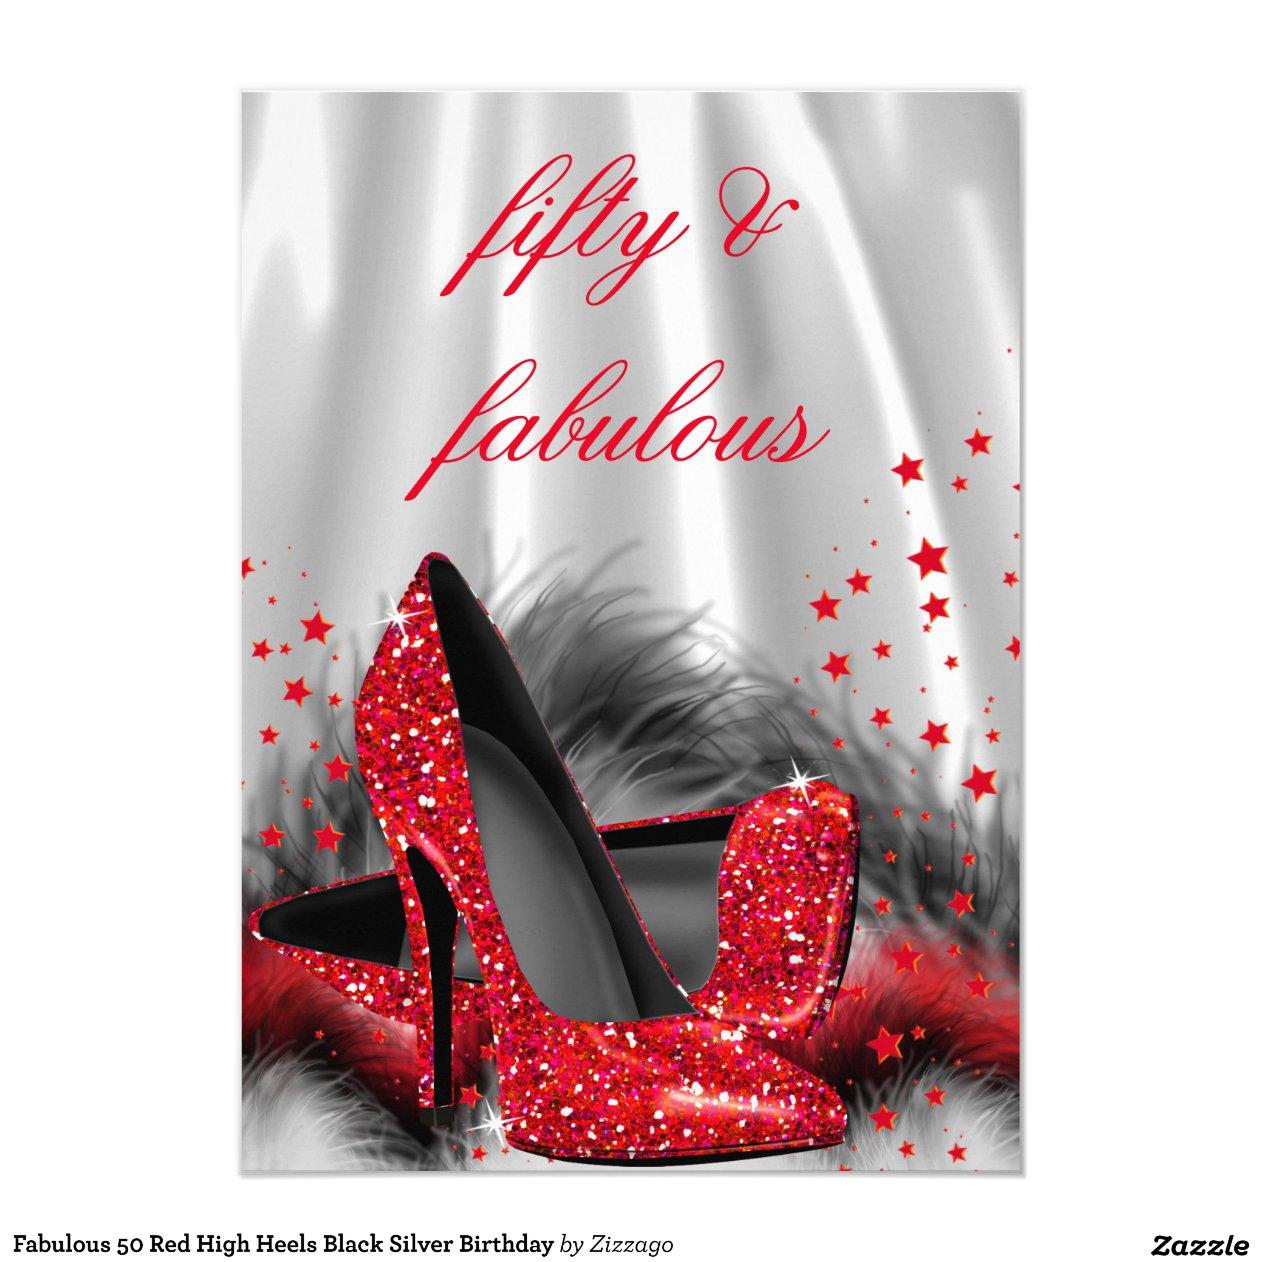 Fabulous 50 Red High Heels Black Silver Birthday 4 5x6 25